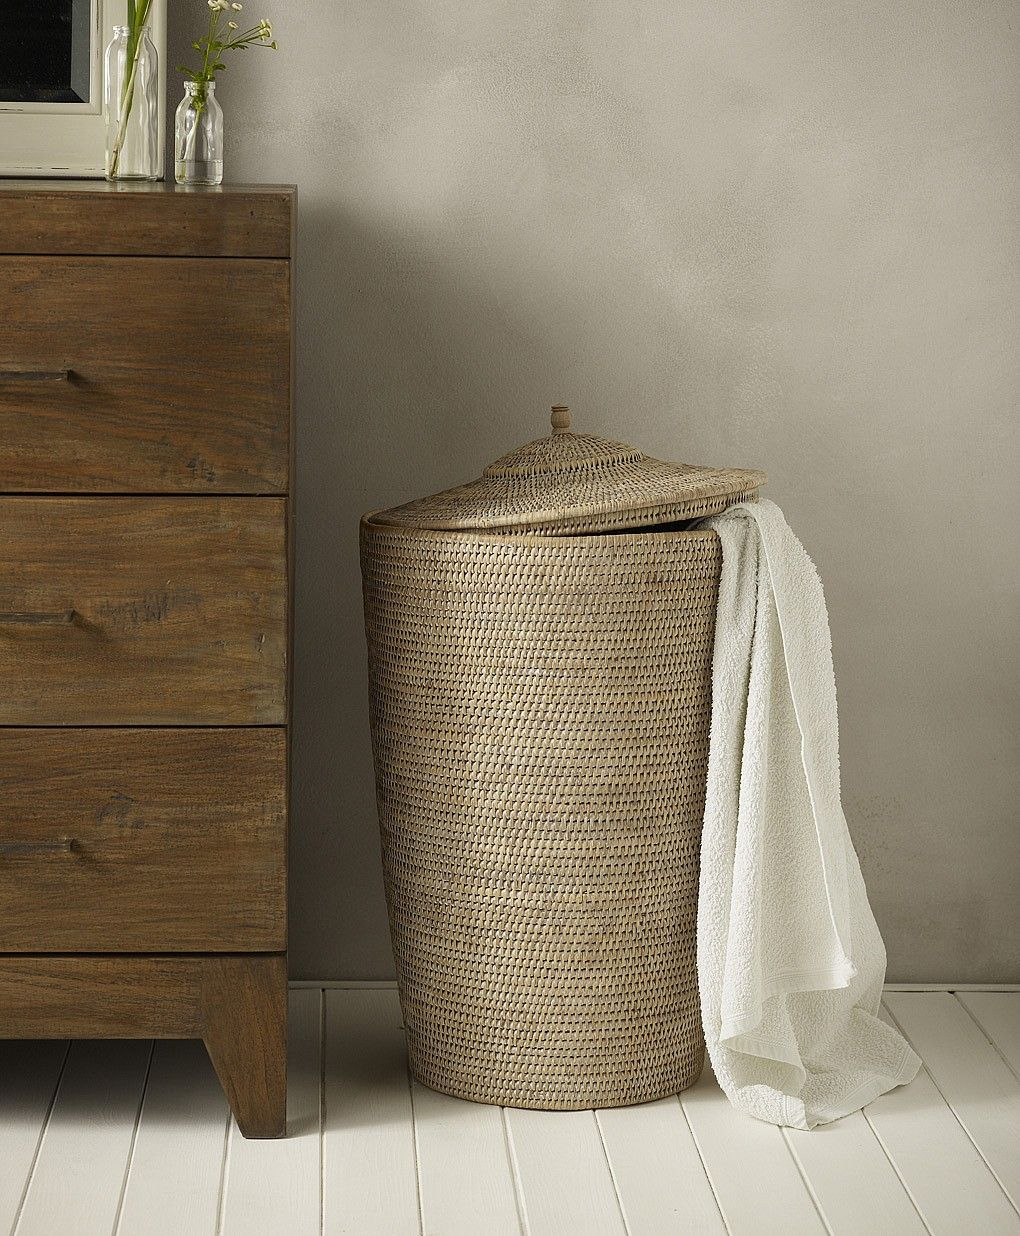 Rattan Laundry Basket Laundry Baskets From Lombok Laundry Room